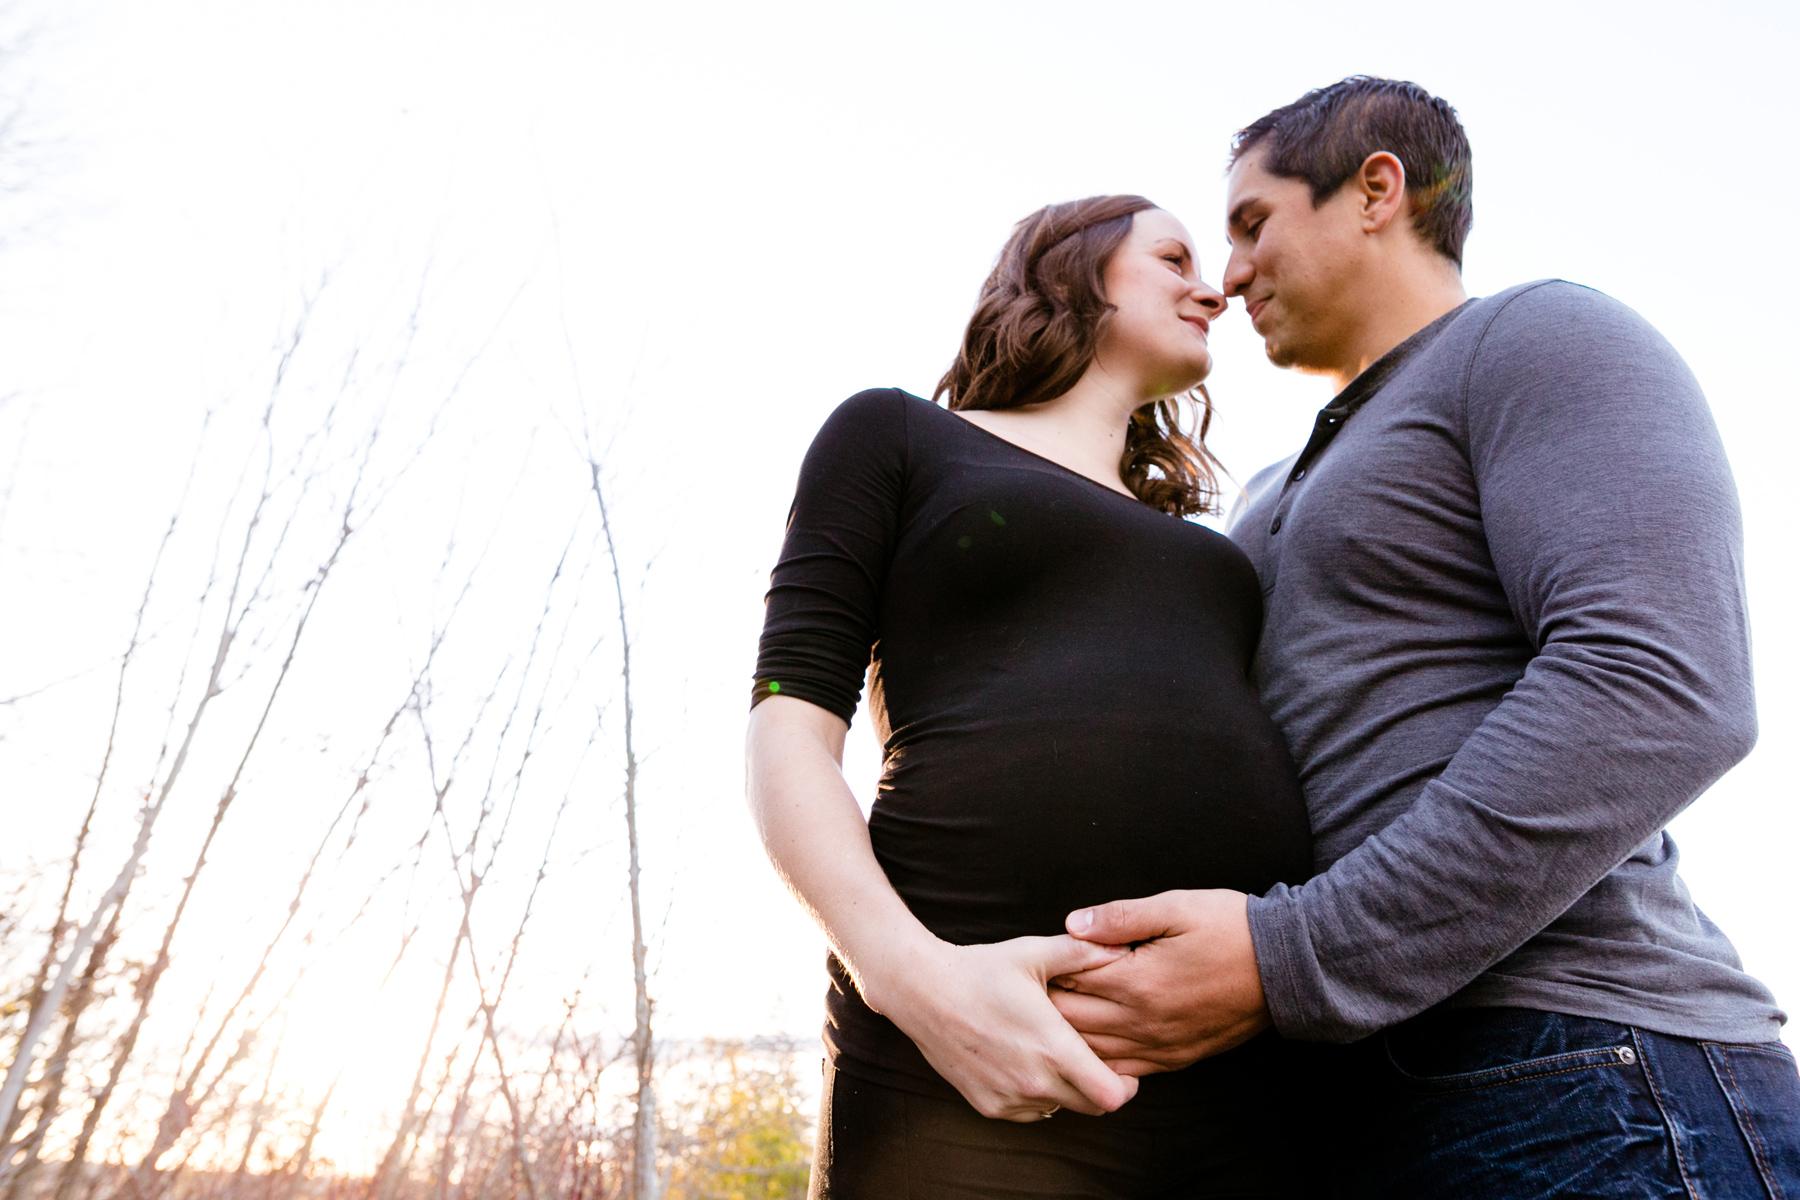 010-amazing-maternity-photos-fredericton-photography-kandisebrown-ka2017